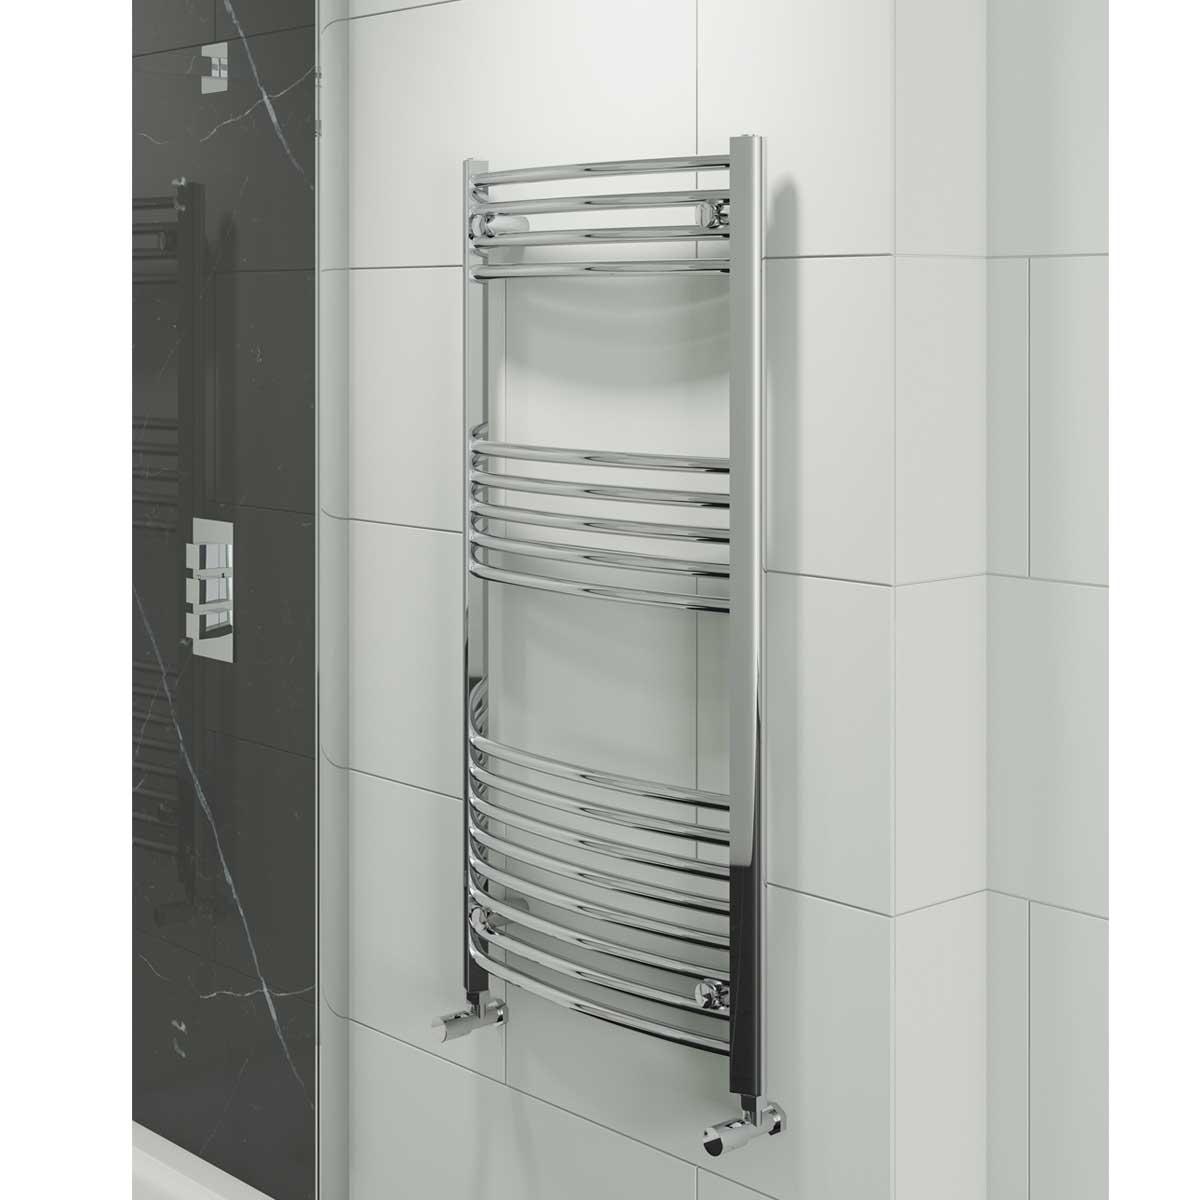 Cali Hayle Curved Heated Towel Rail 1000mm H x 500mm W Chrome